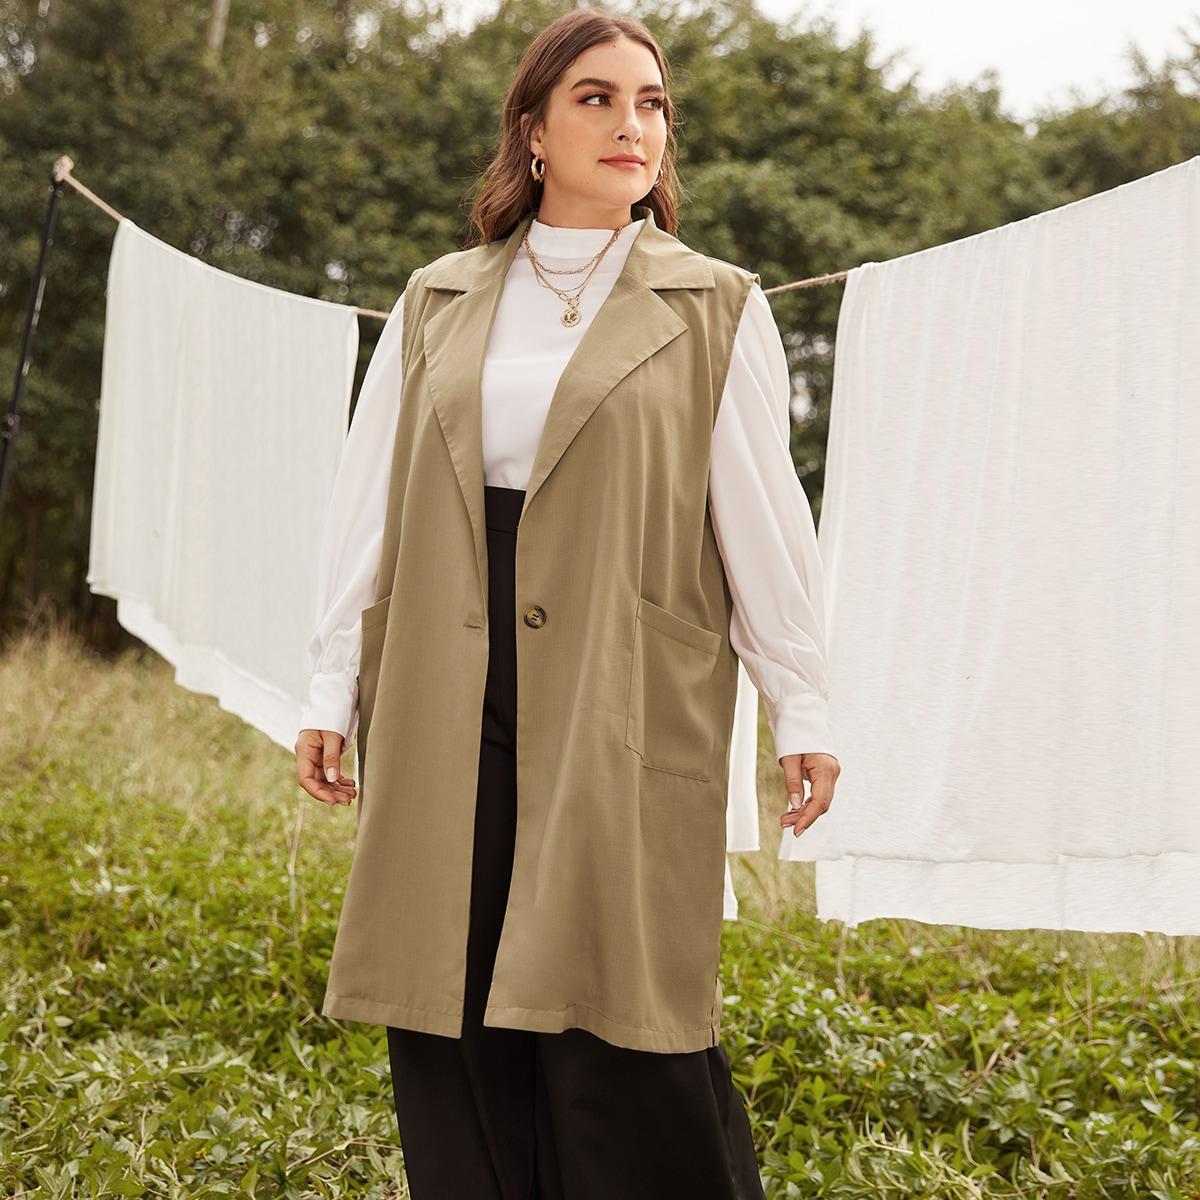 Пальто-жилет размера плюс с лацканами